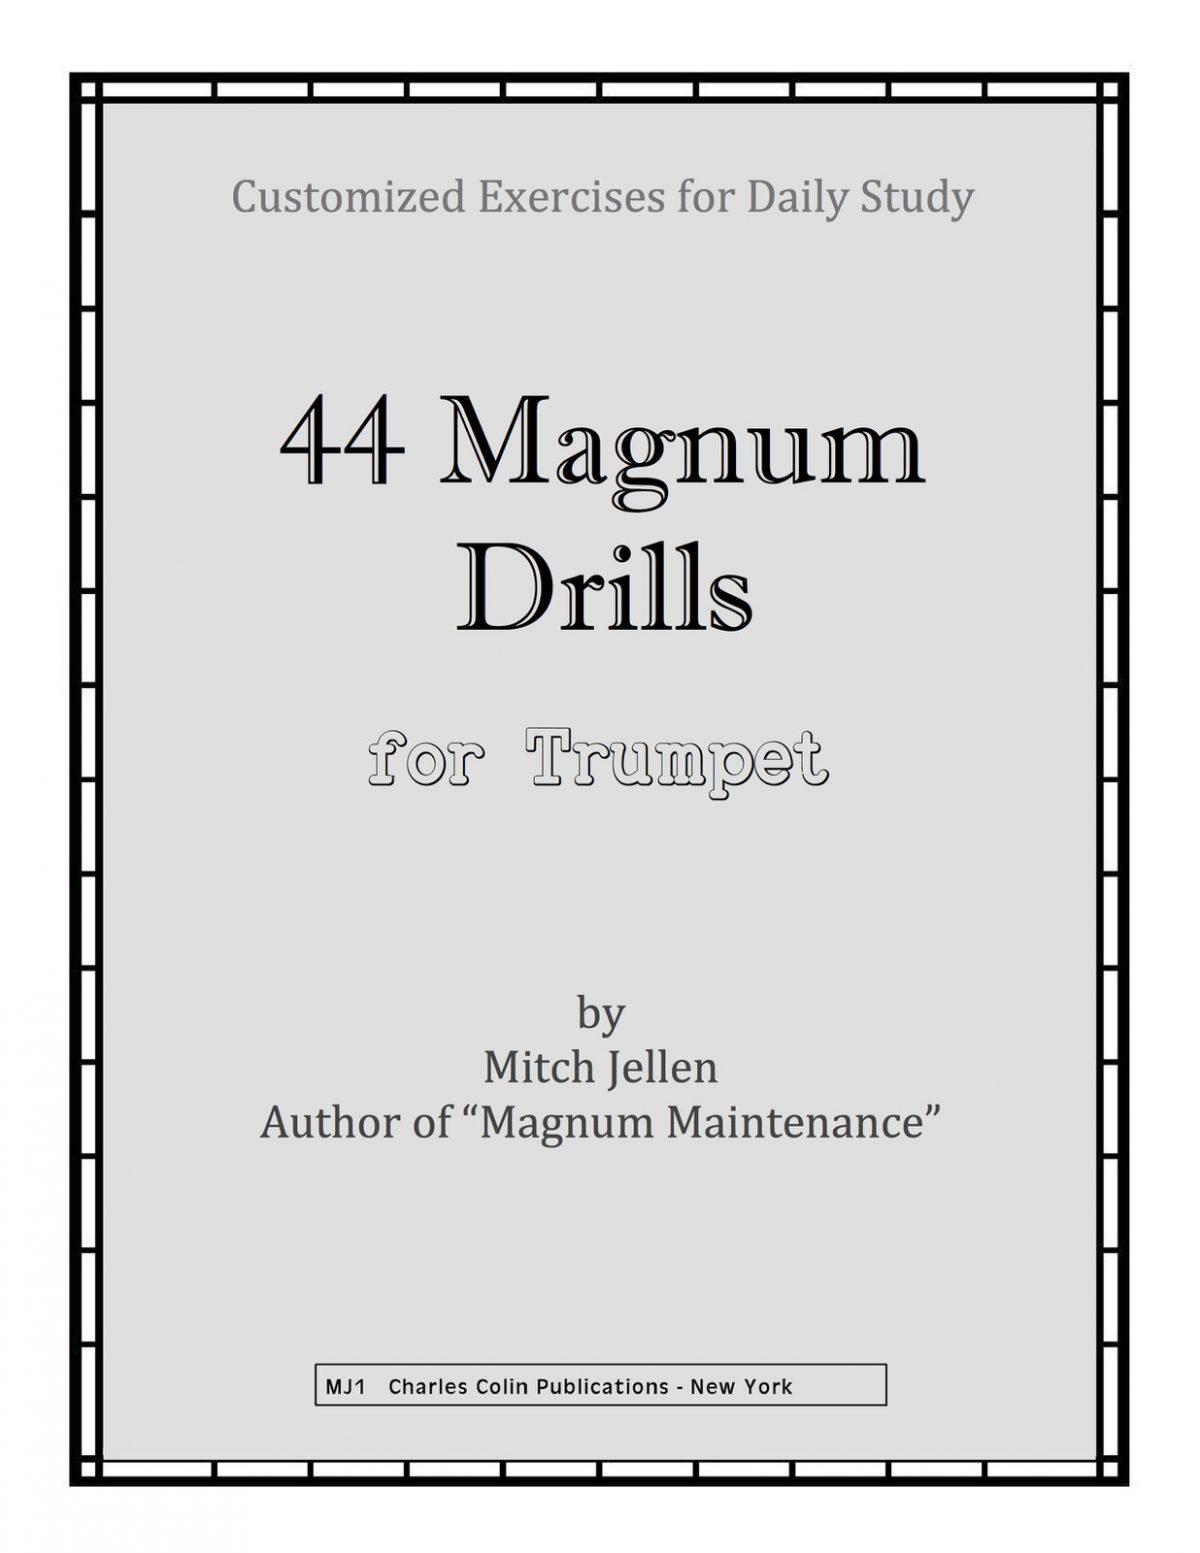 Jellen, 44 Magnum Drills for Trumpet